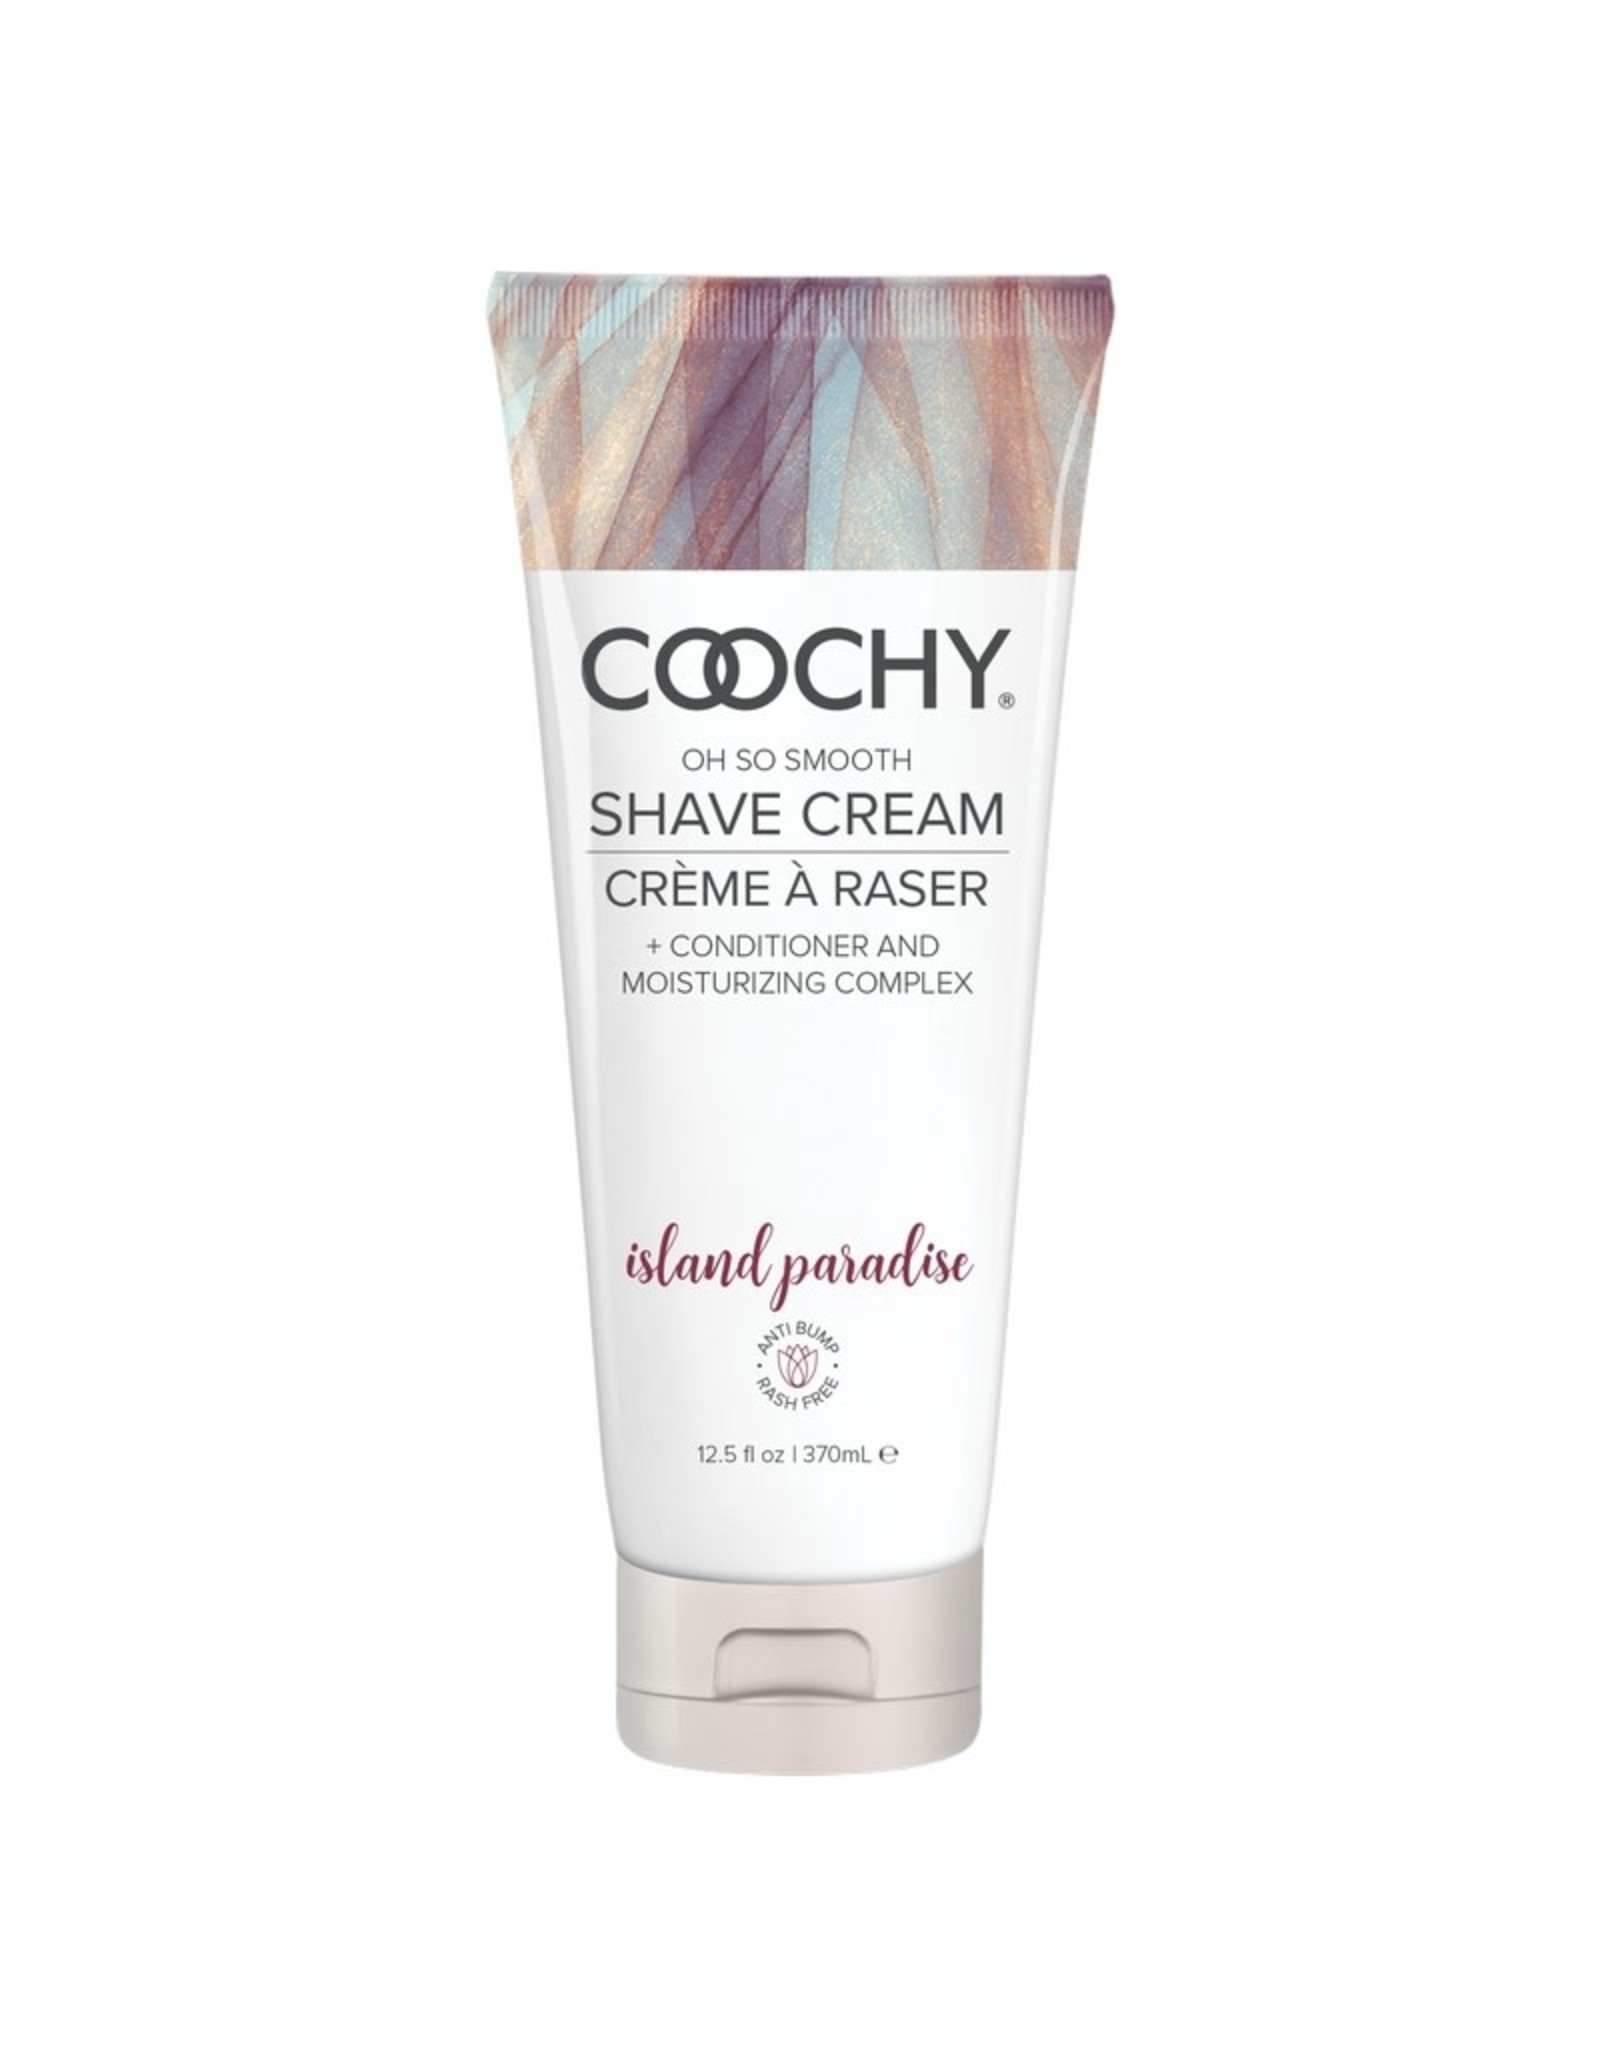 Coochy Coochy - Island Paradise (12.5 oz)